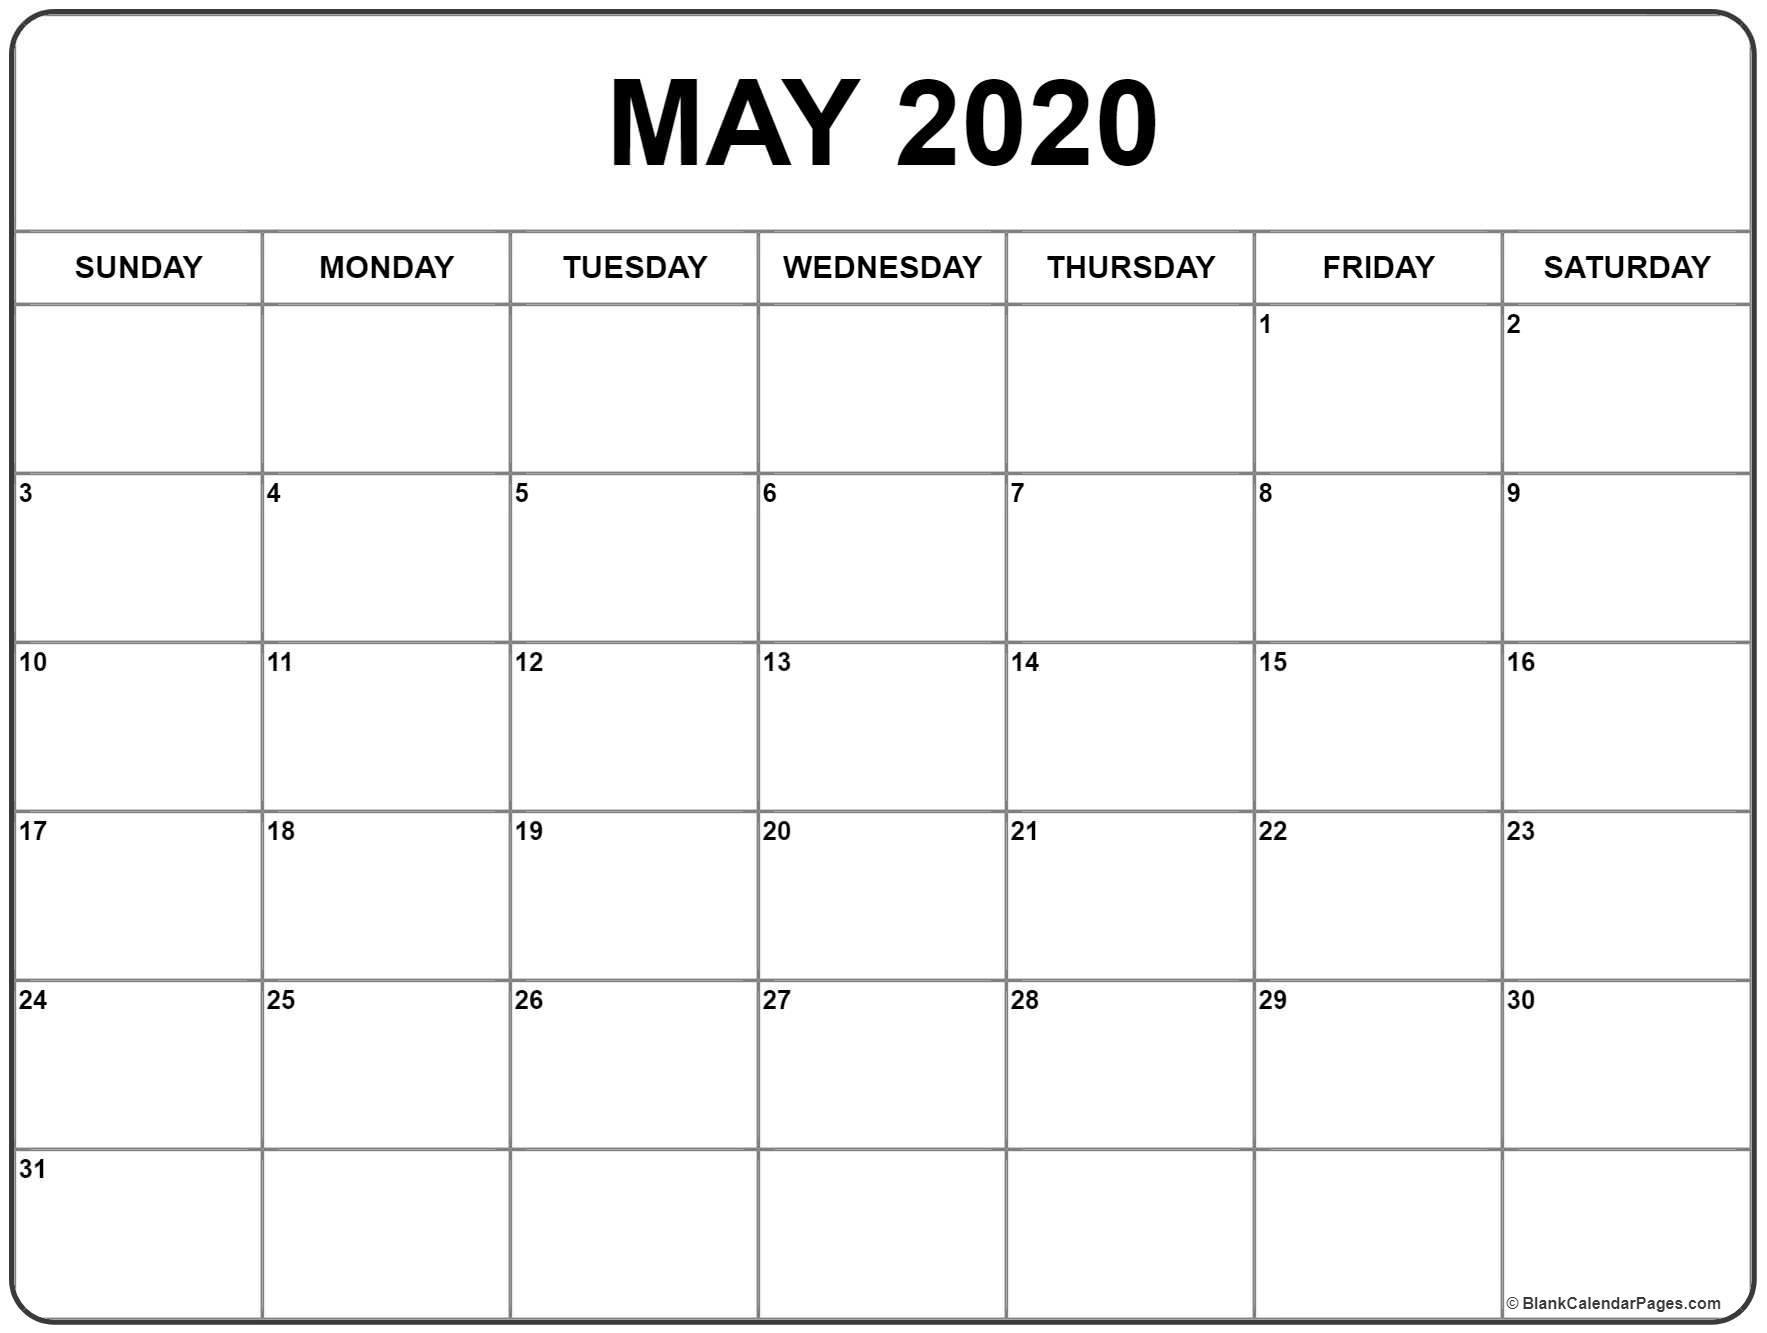 Blank May 2020 Calendar Printable